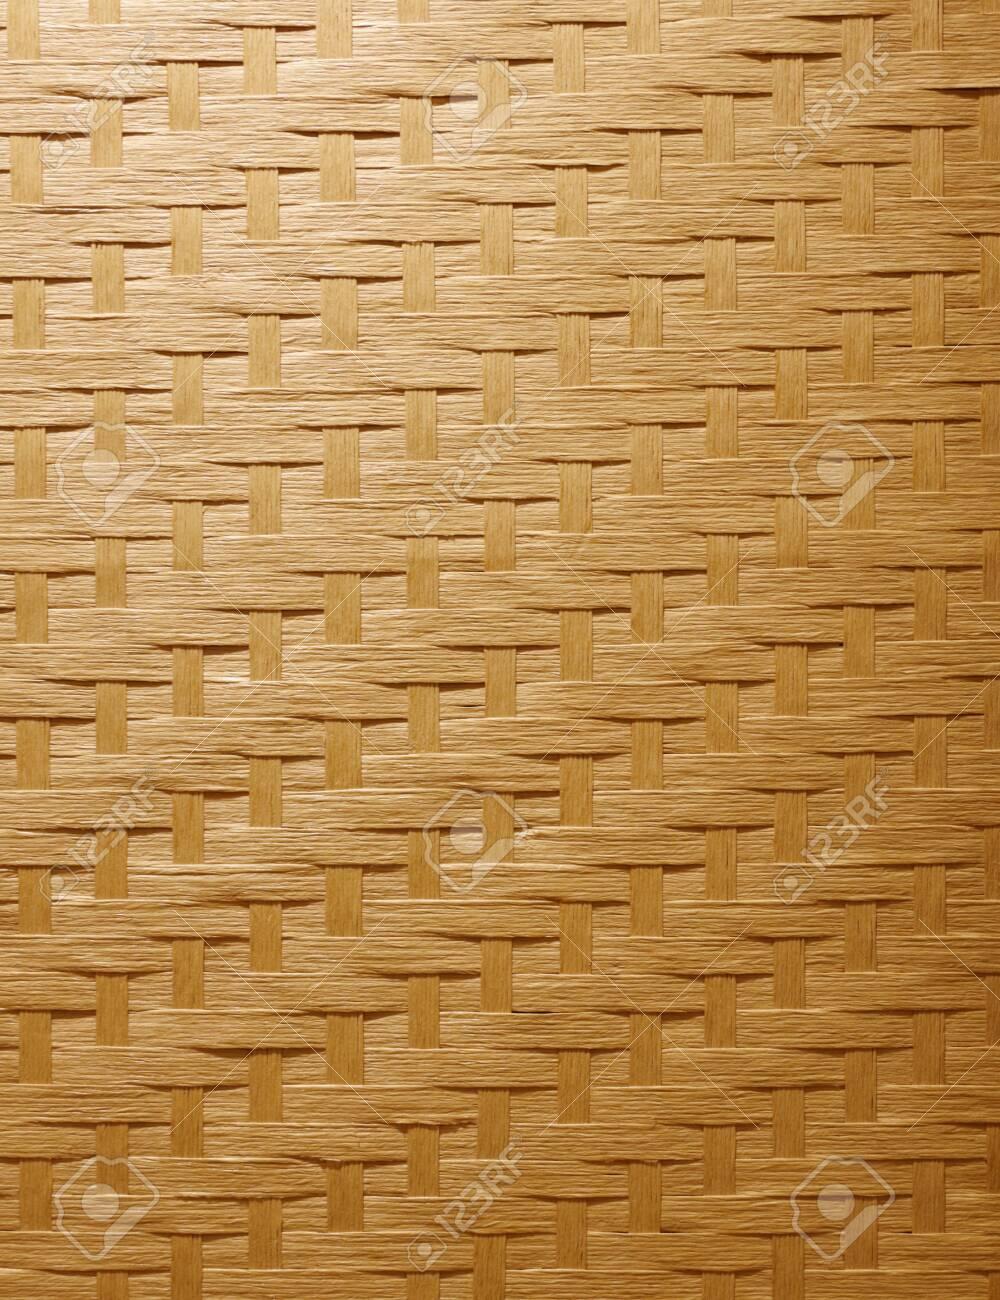 Bamboo knitting background - 129192439